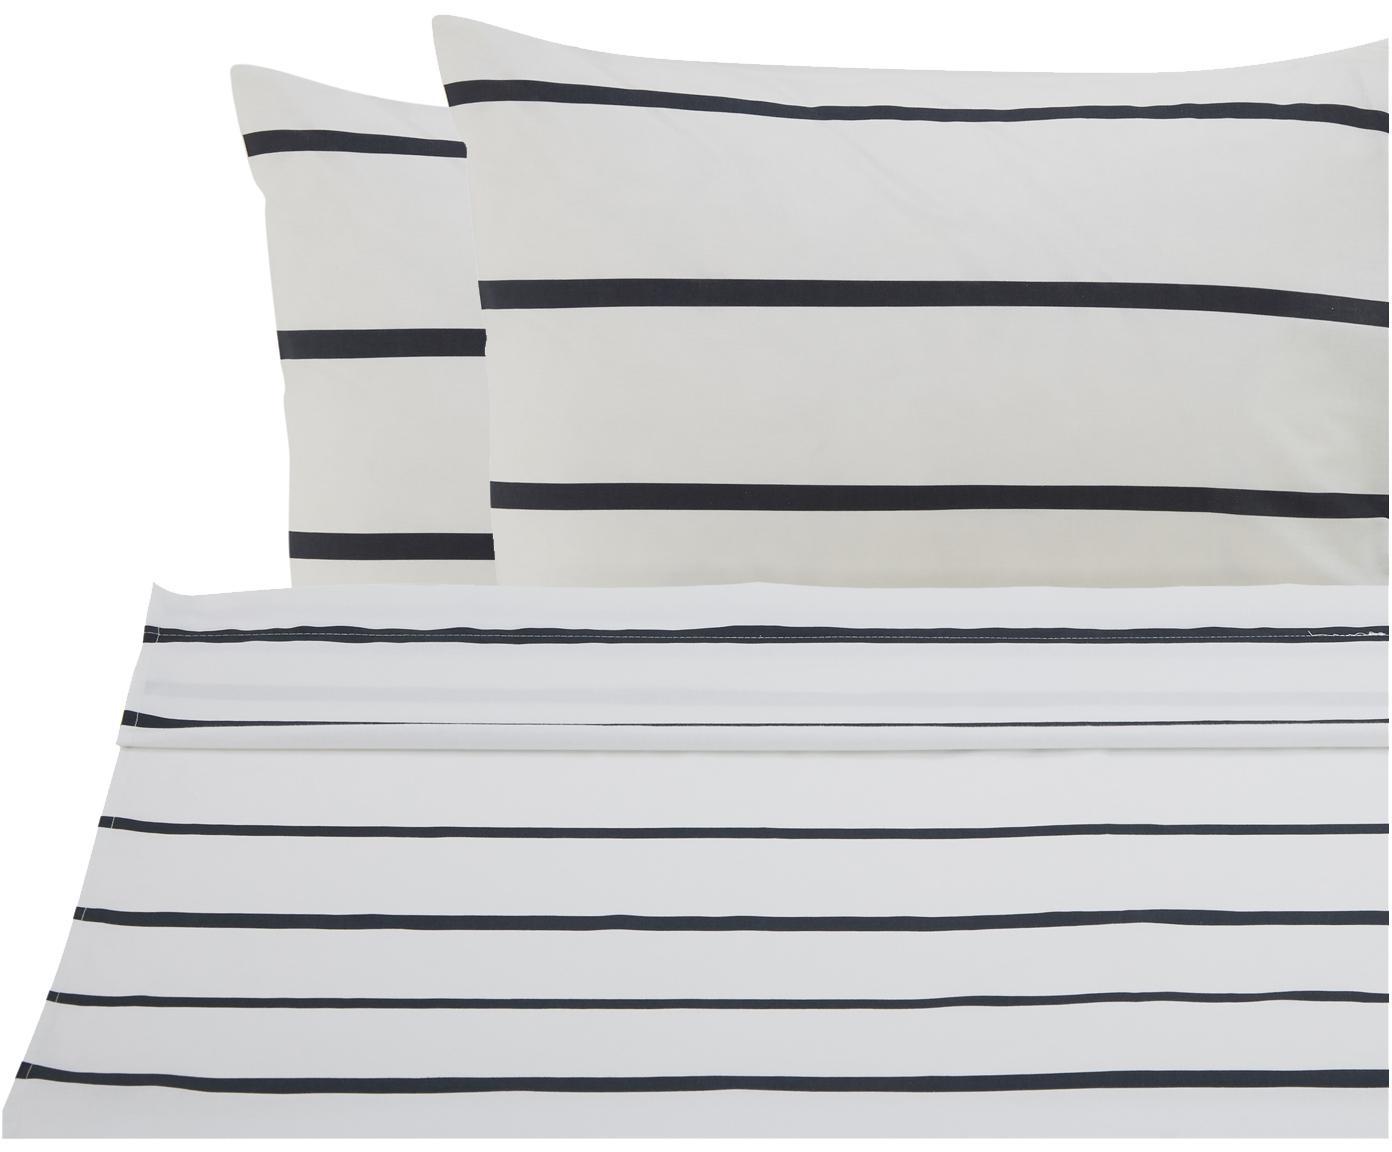 Set lenzuola in cotone ranforce Blush 3 pz, Tessuto: Renforcé, Bianco, nero, rosa, 240 x 270 cm